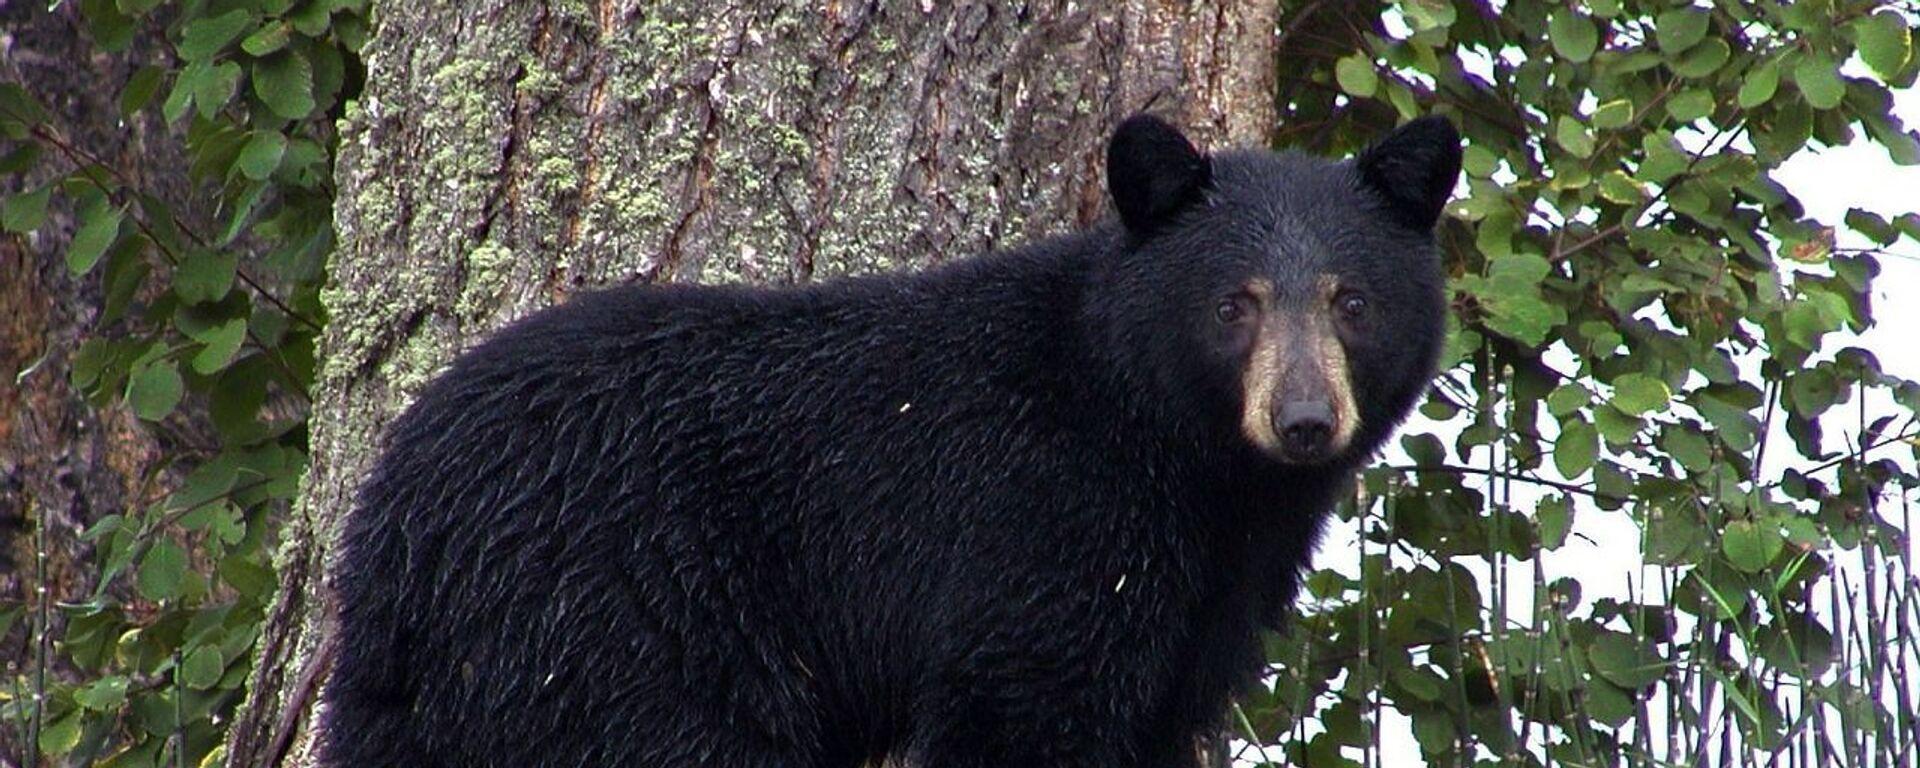 Un oso negro (imagen referencial) - Sputnik Mundo, 1920, 24.07.2021